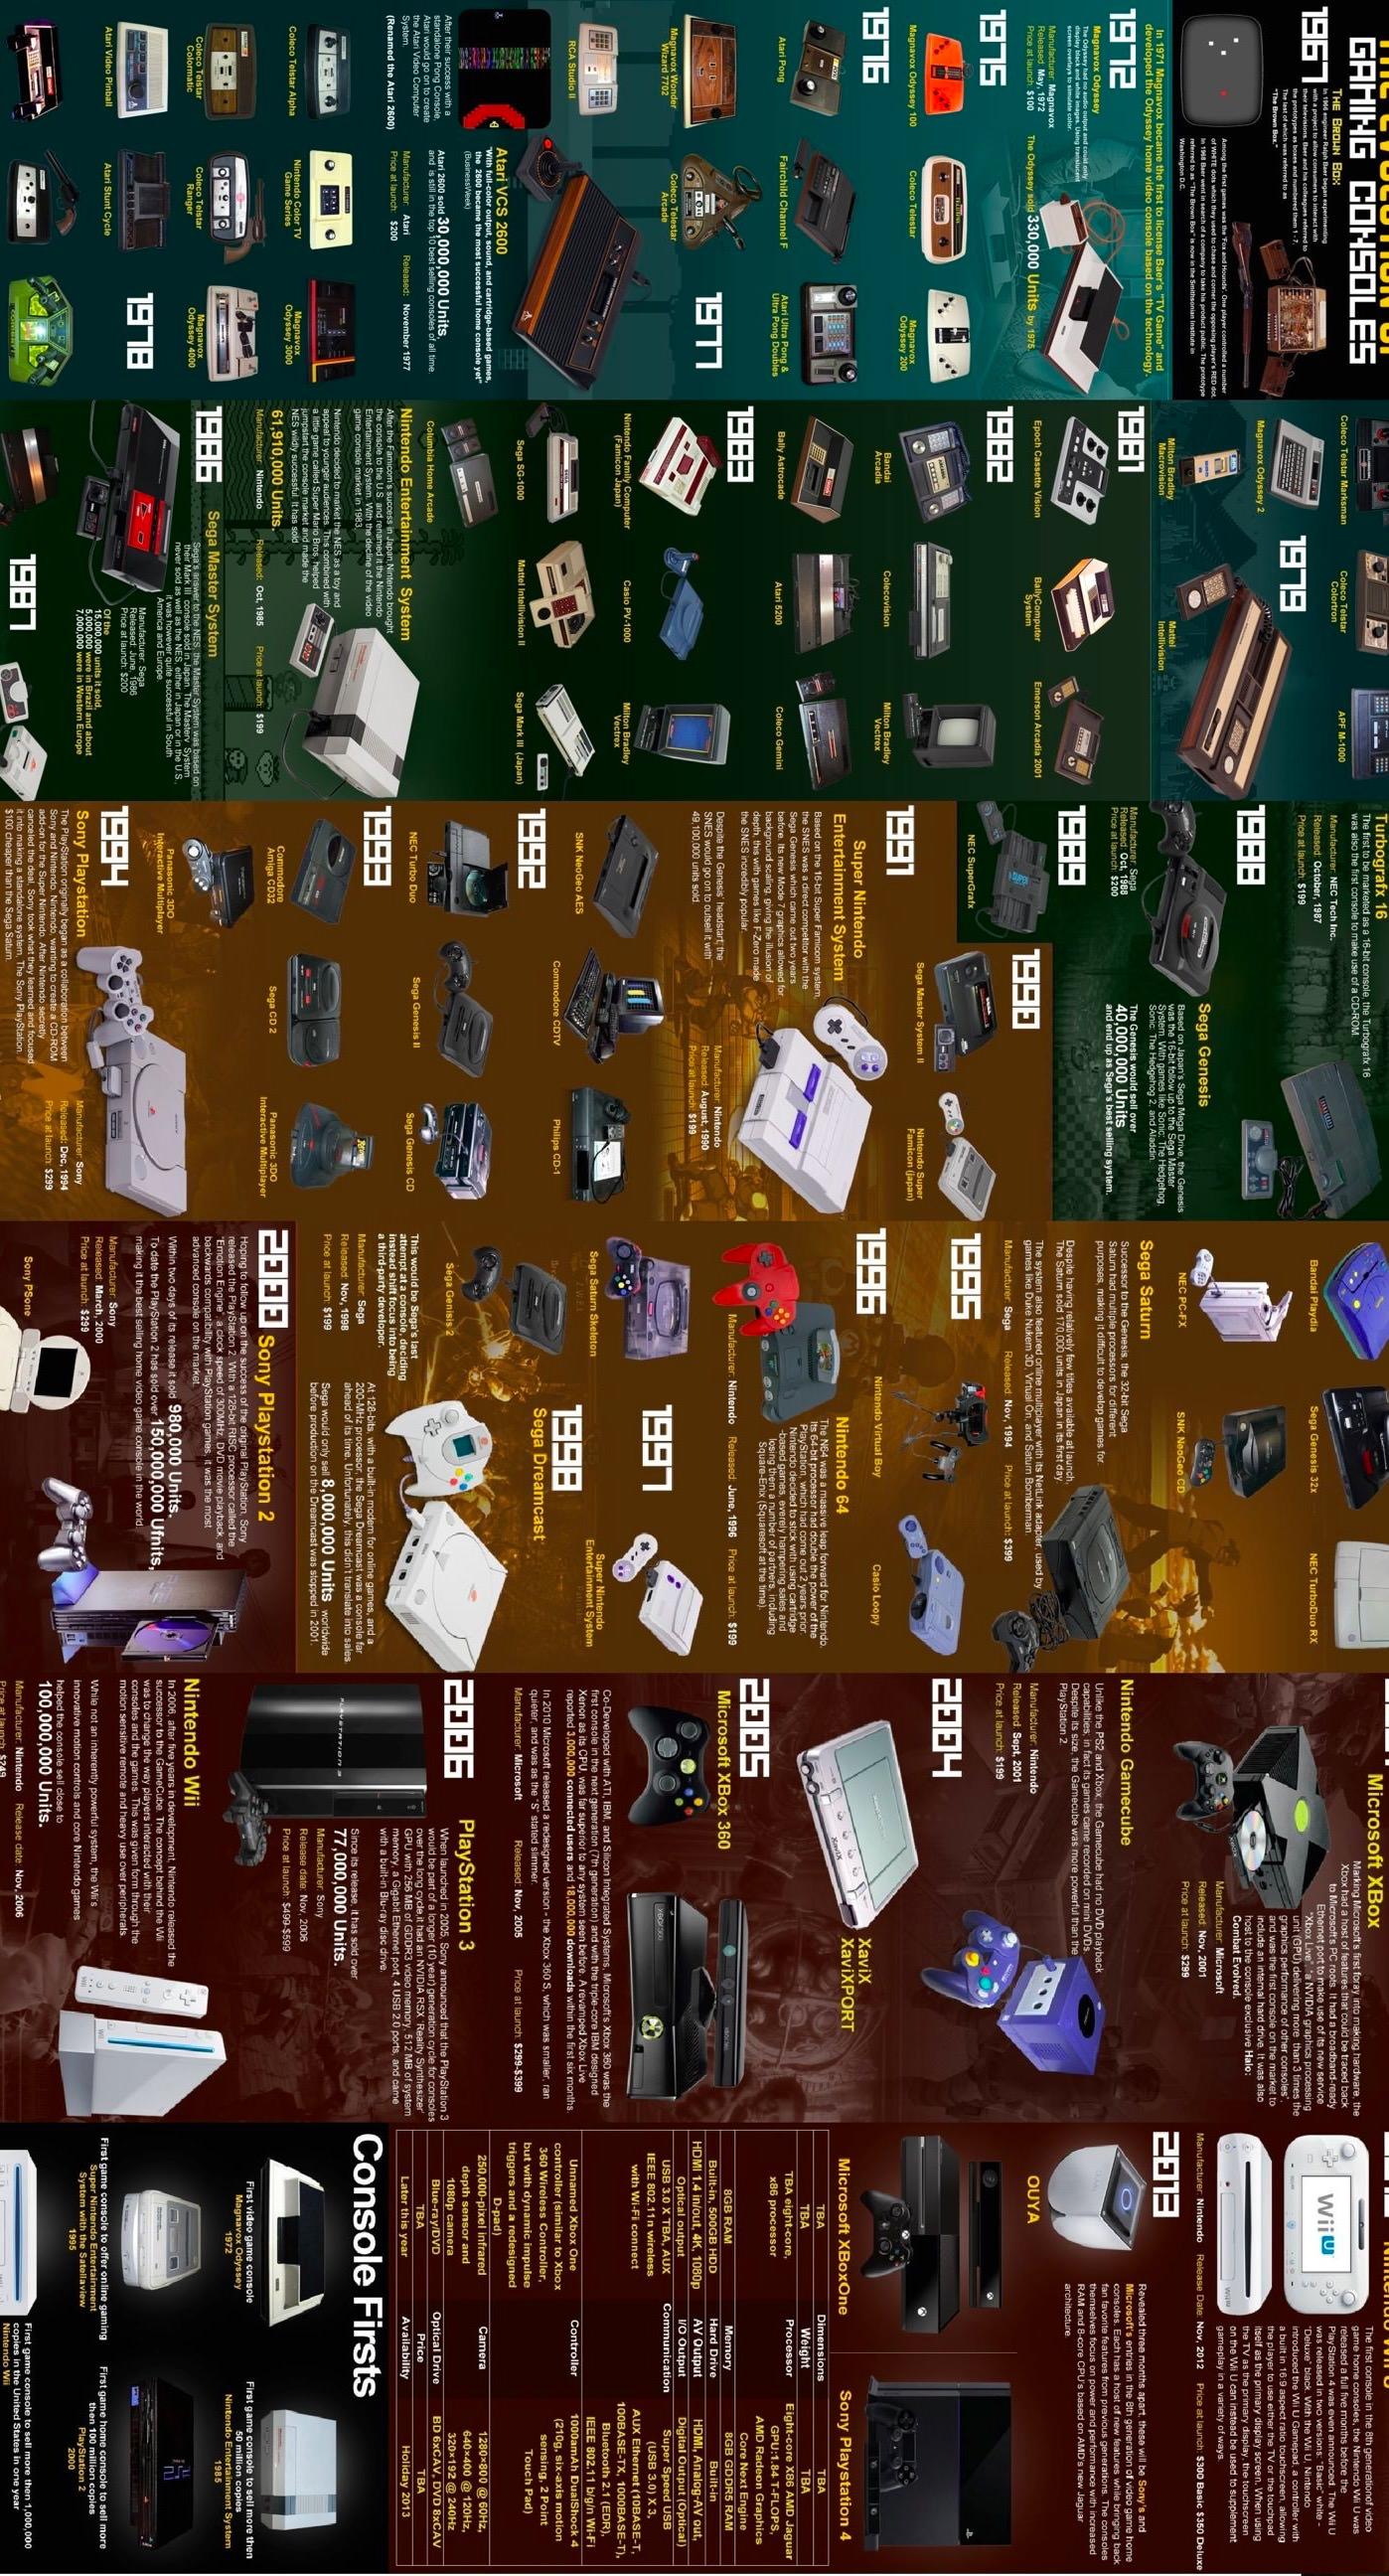 iphone8plus 1398x2592 wallpaper 01680